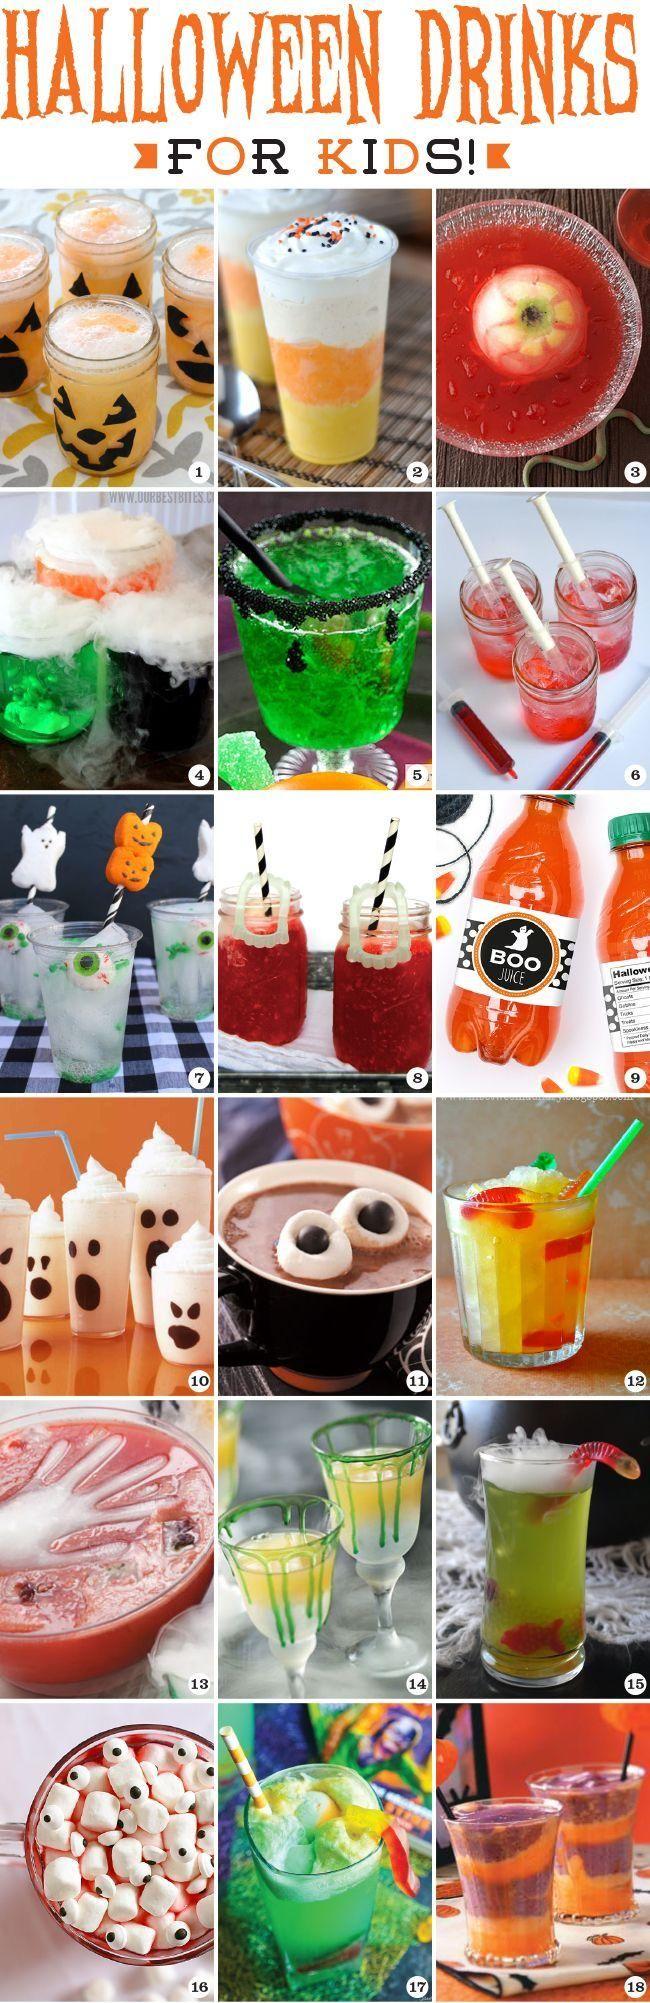 495 best halloween images on pinterest | halloween recipe, halloween